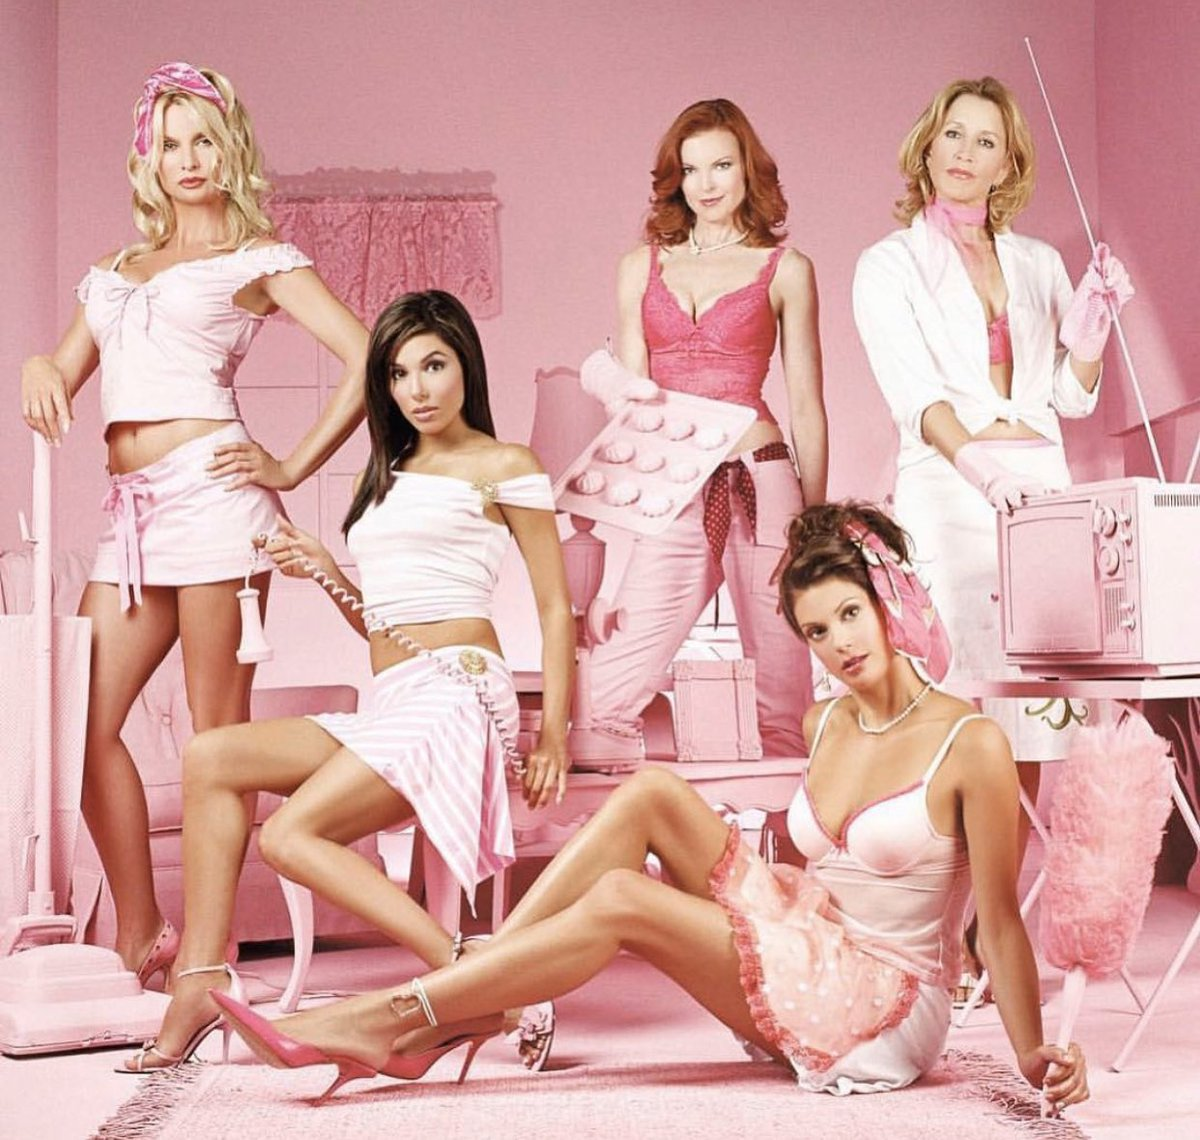 The girls in pink #desperatehousewives #nicollettesheridan #wisterialane #fairview #ediebritt #marciacross #breevandekamp #evalongoria #gabriellesolis #terihatcher #susanmayer #felicityhuffman #lynettescavopic.twitter.com/fkxpcgvSgW